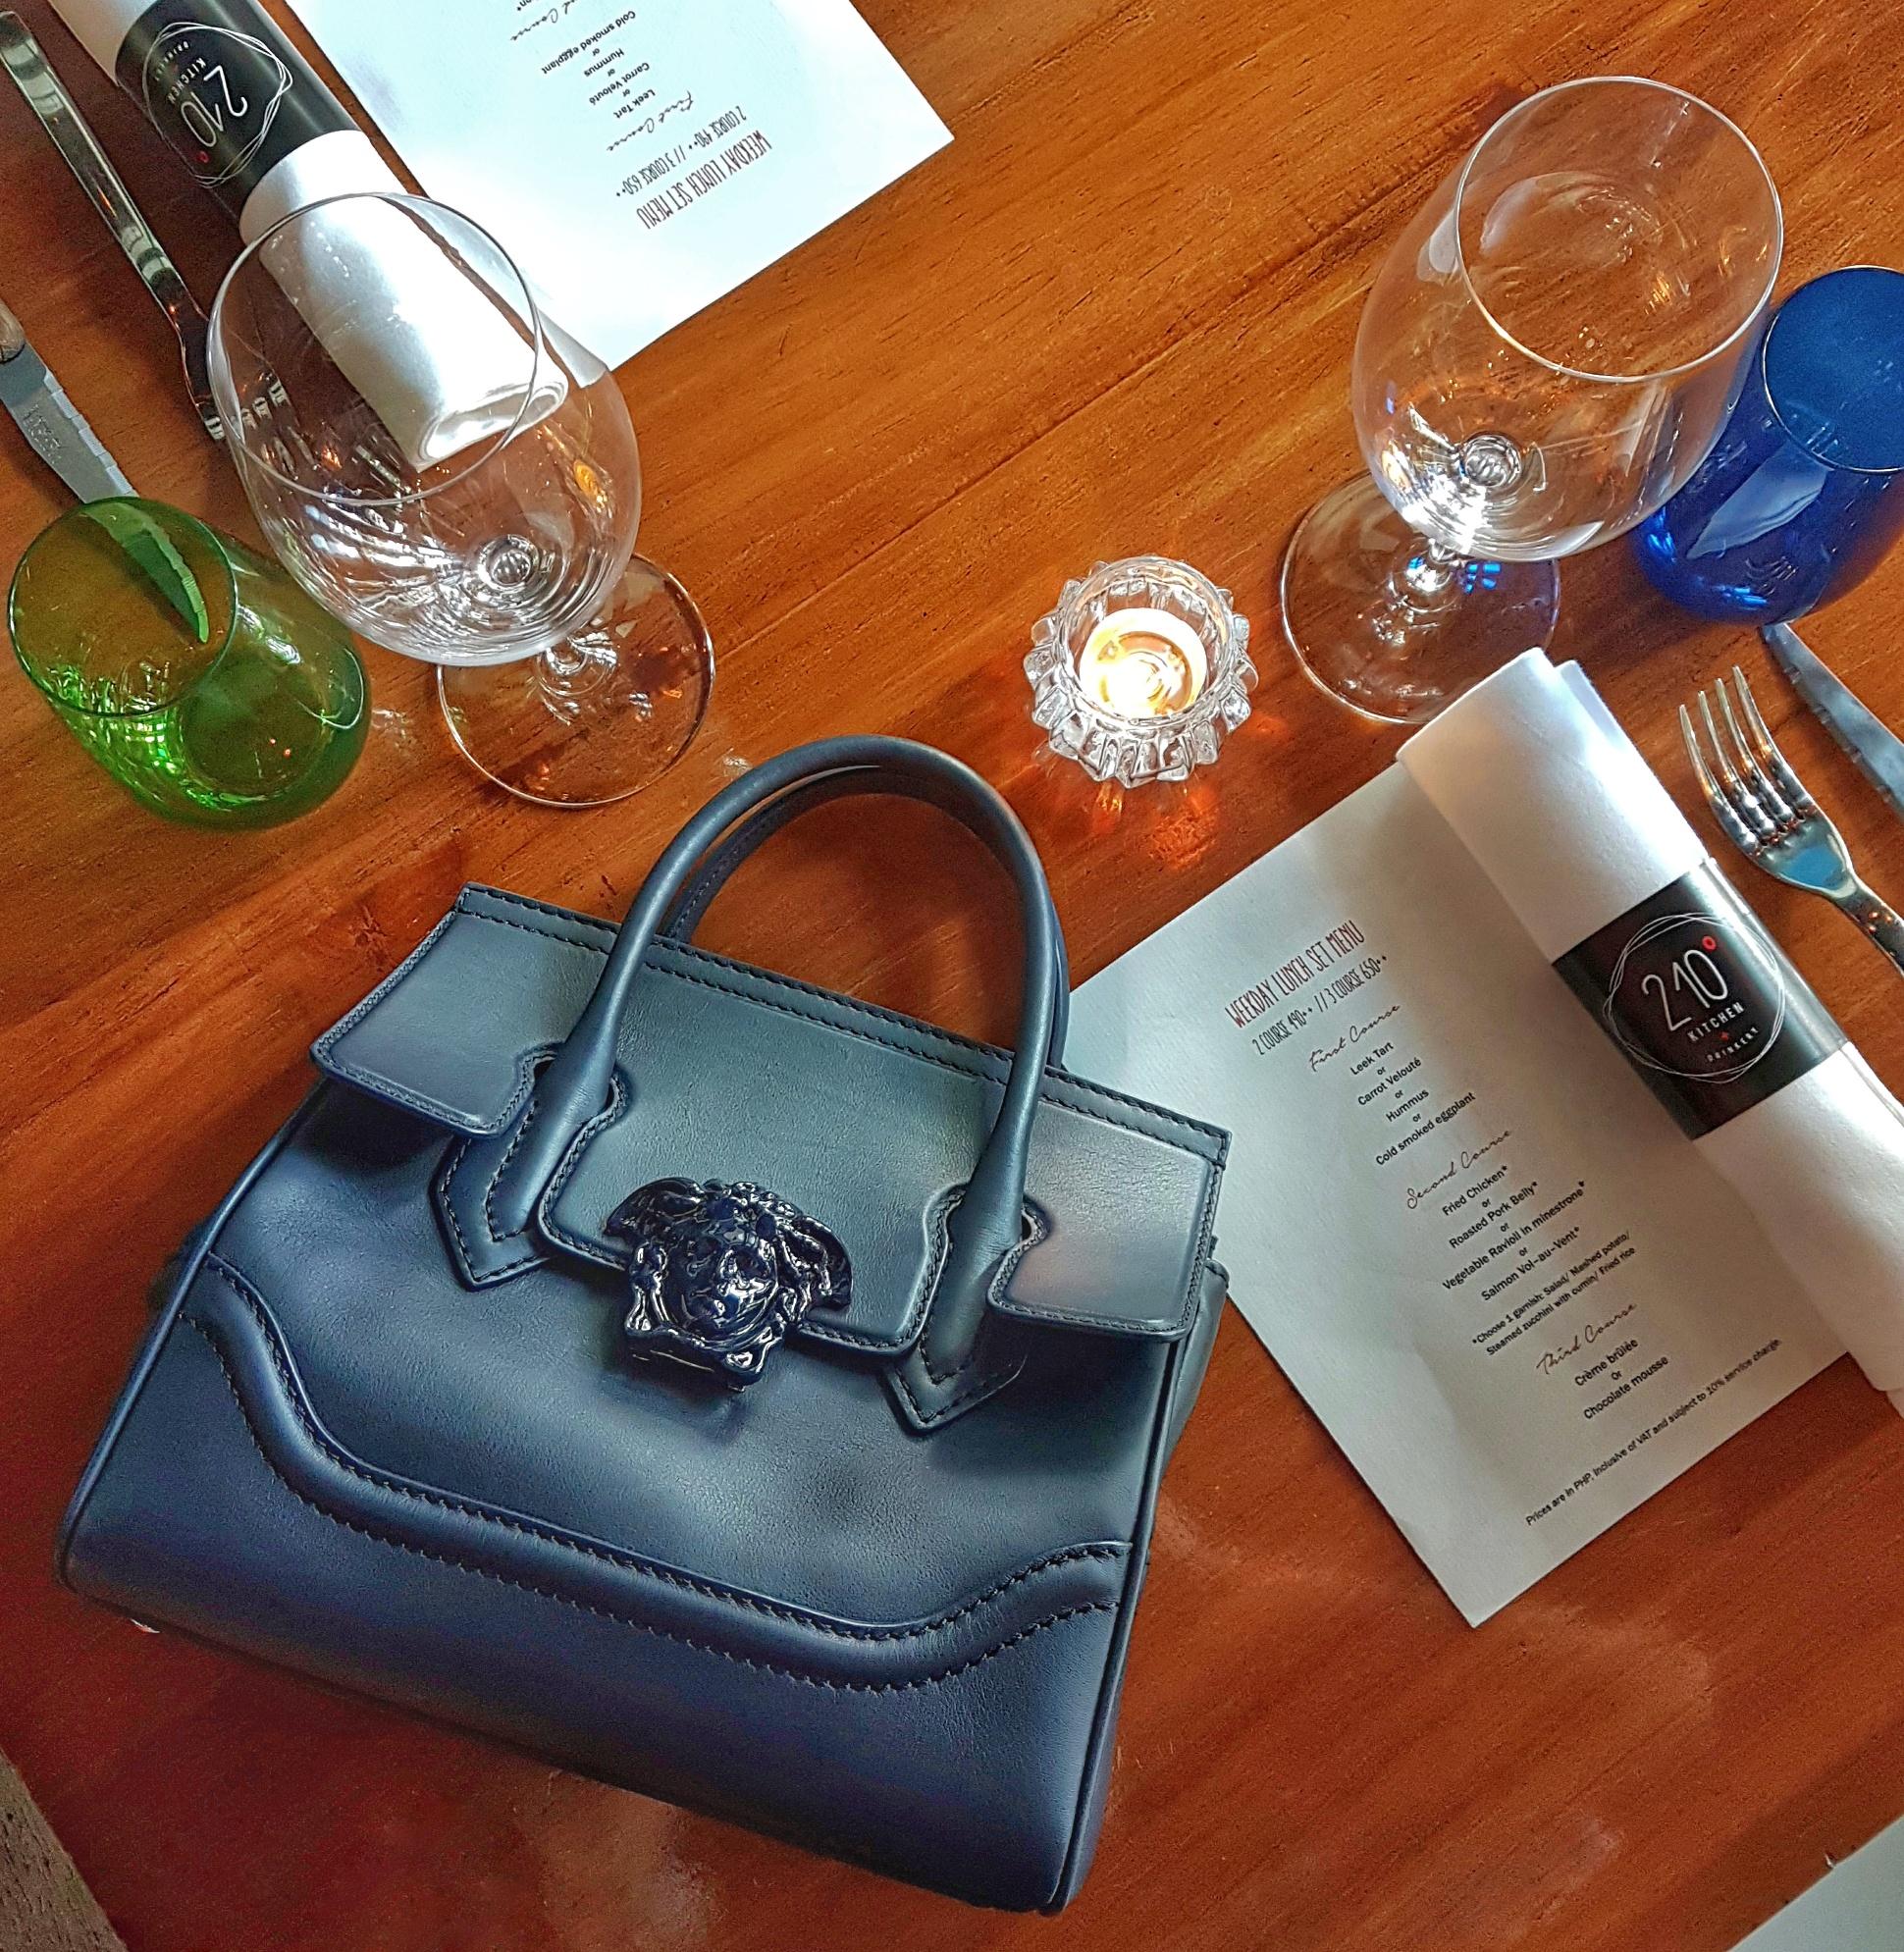 e9eb5c3ba1 Bag Review: Versace Palazzo Empire Bag – The Bag Hag Diaries